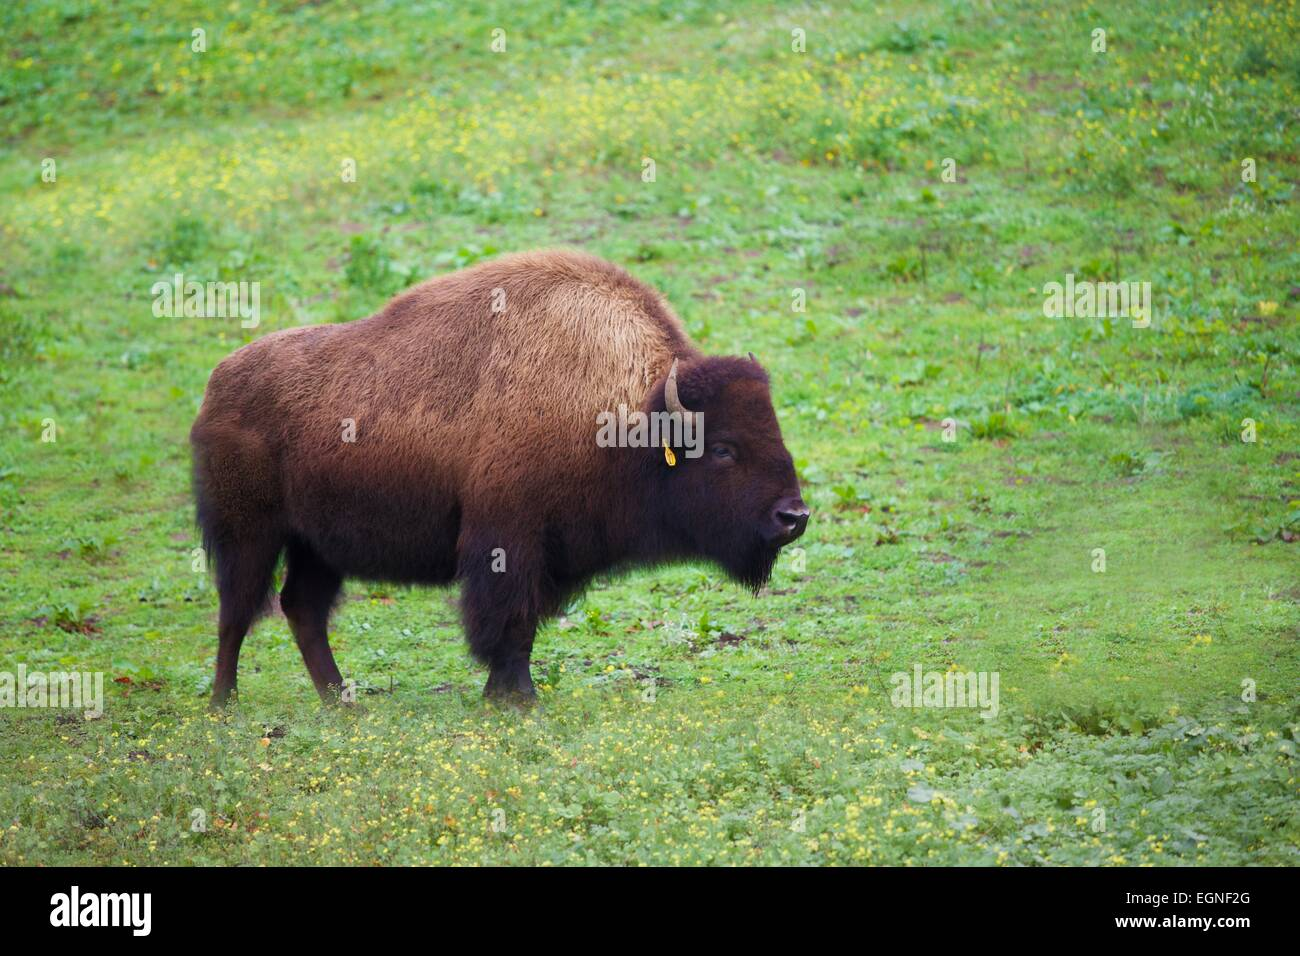 Bison in Golden Gate Park, San Francisco, California - Stock Image